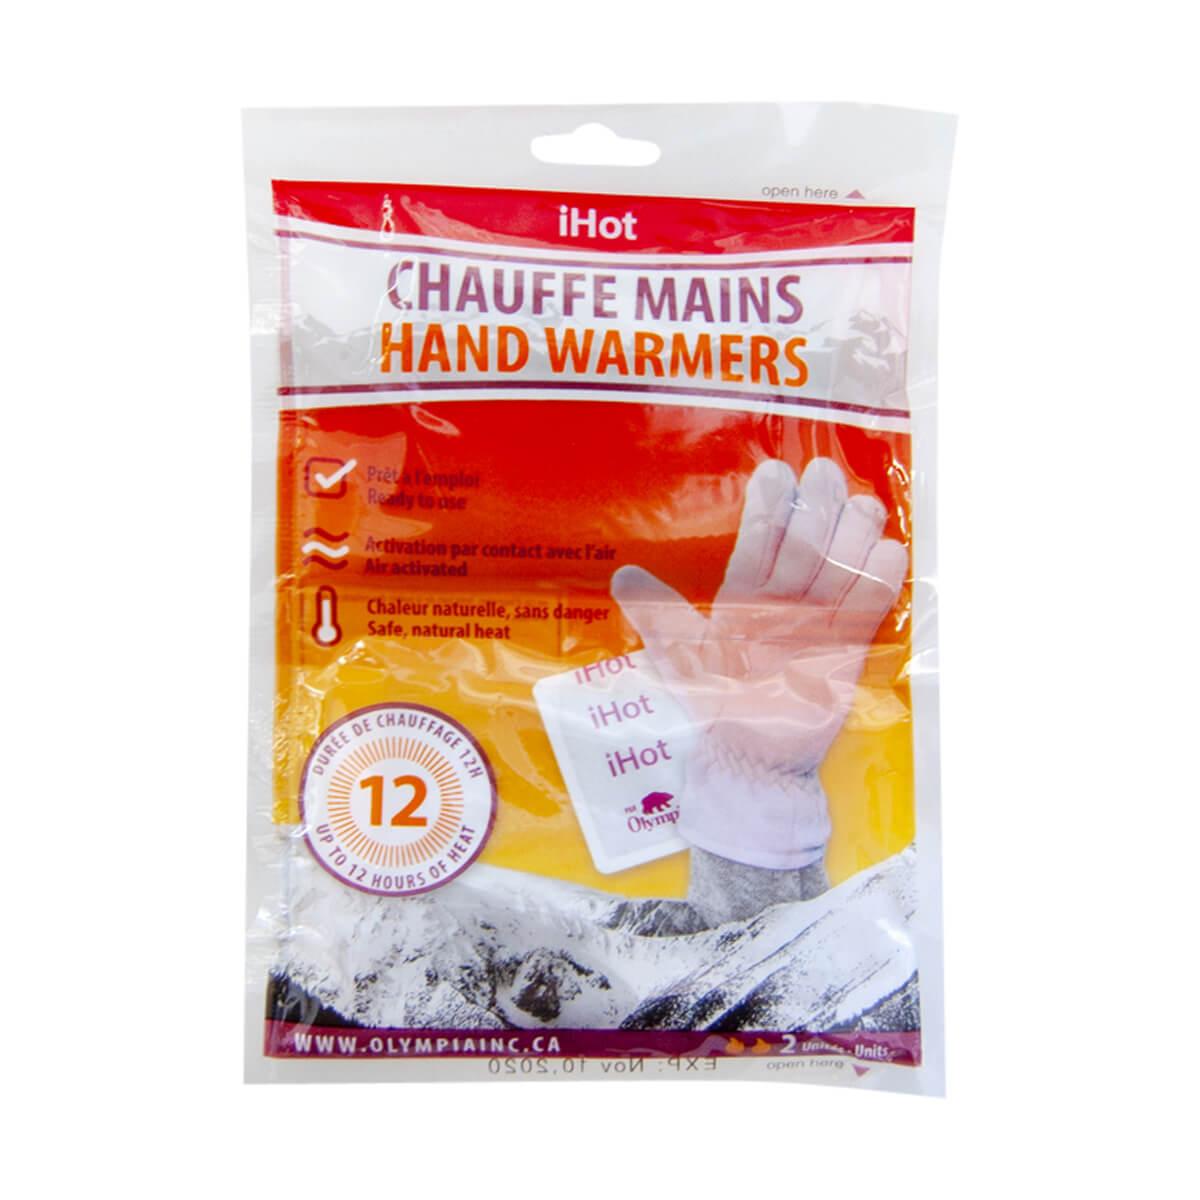 iHot Hand Warmers